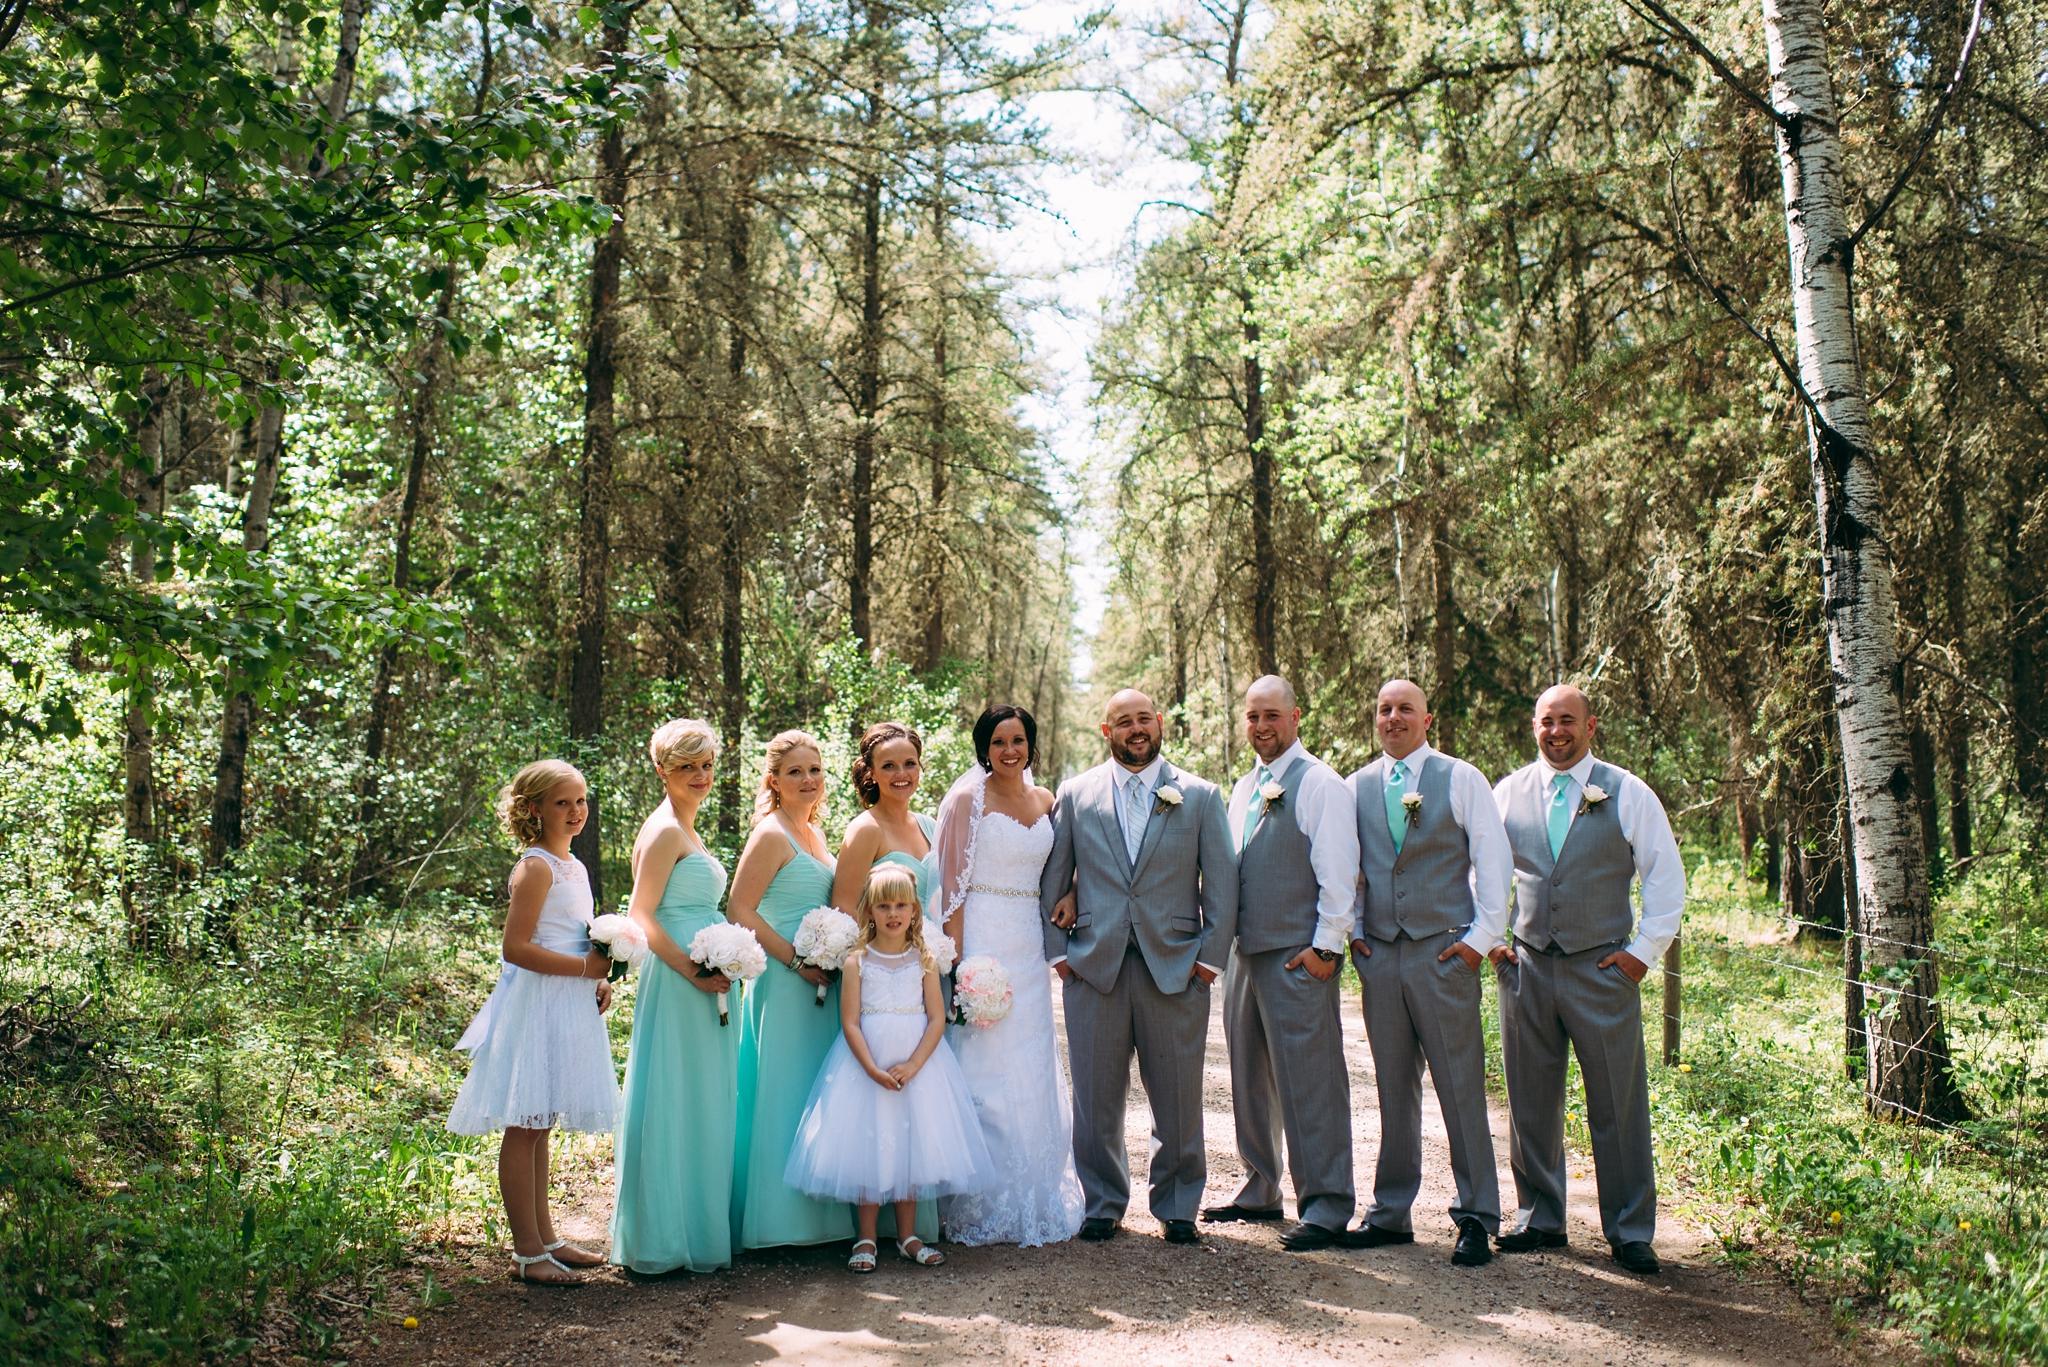 kaihla_tonai_intimate_wedding_elopement_photographer_1528